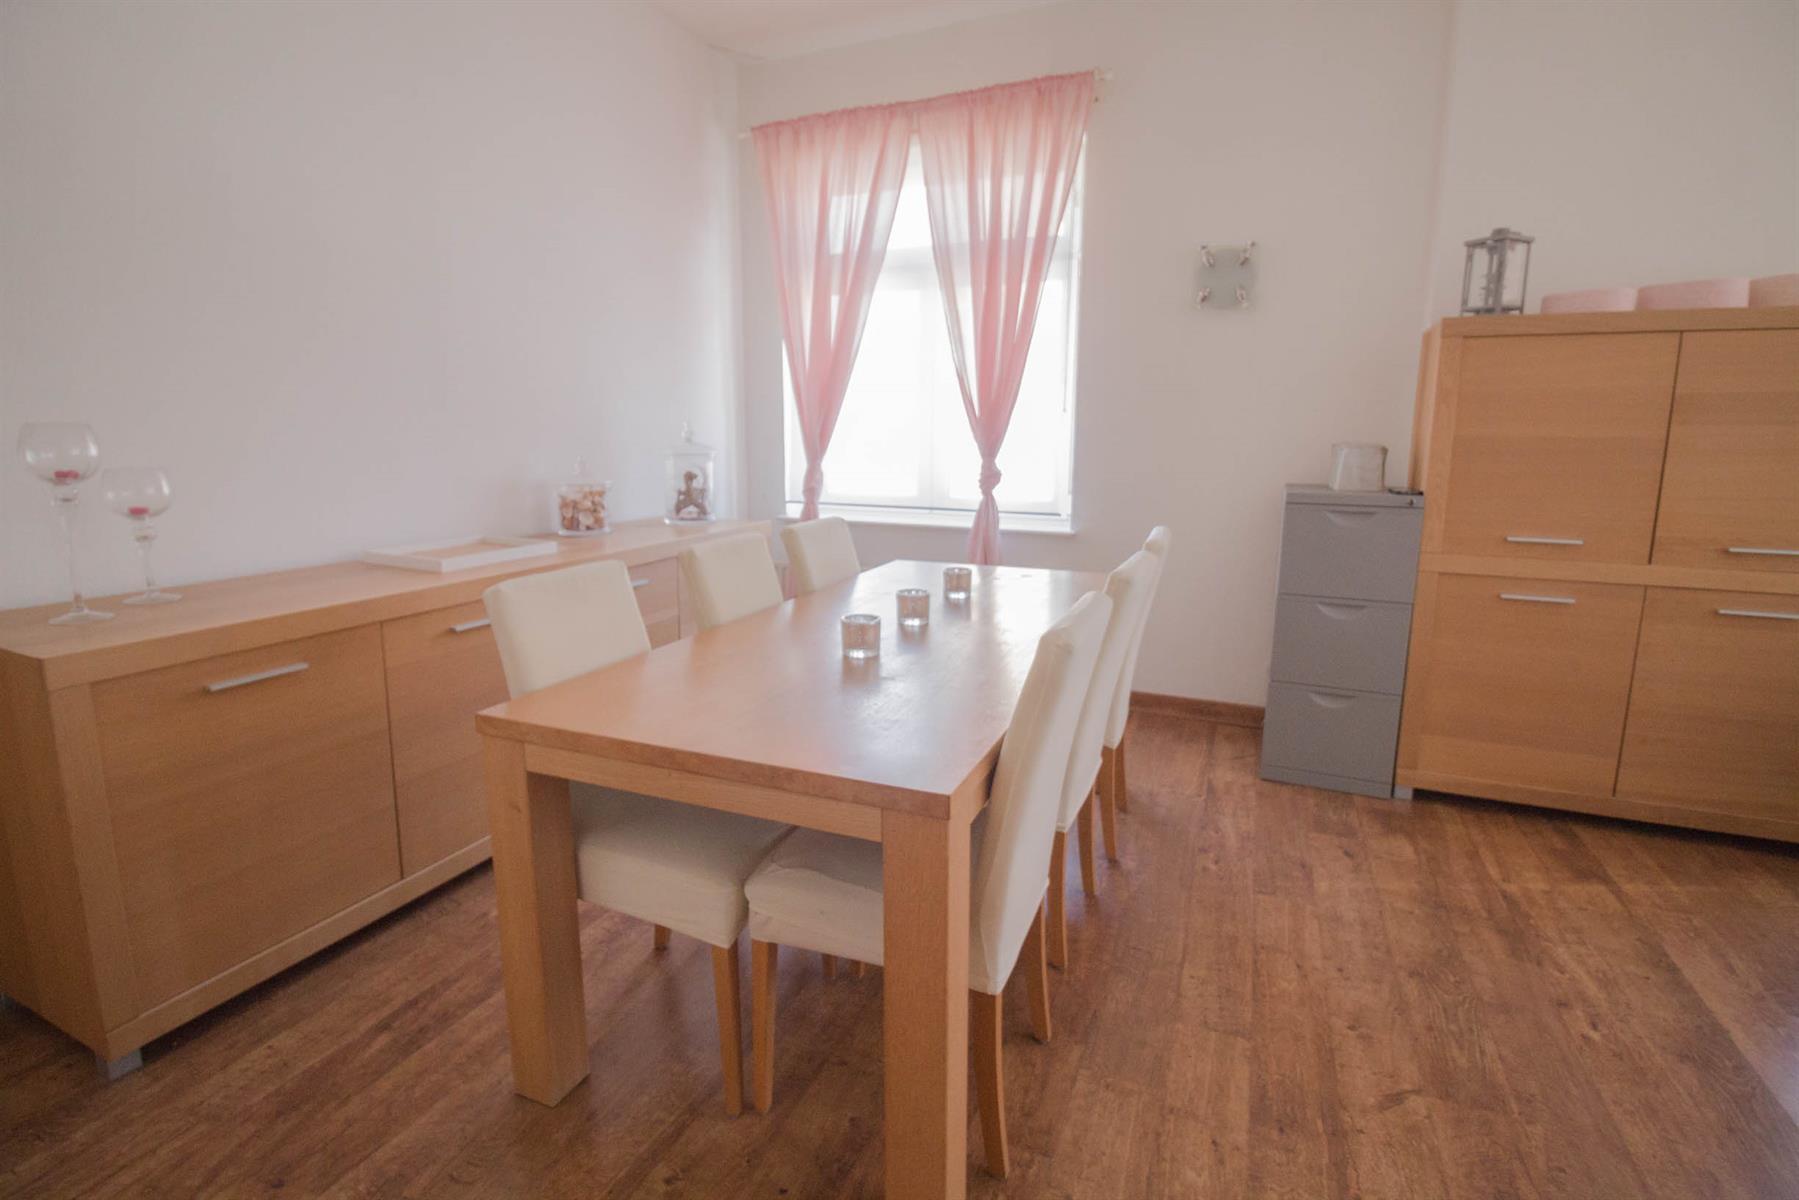 Appartement - Charleroi - #4416667-8